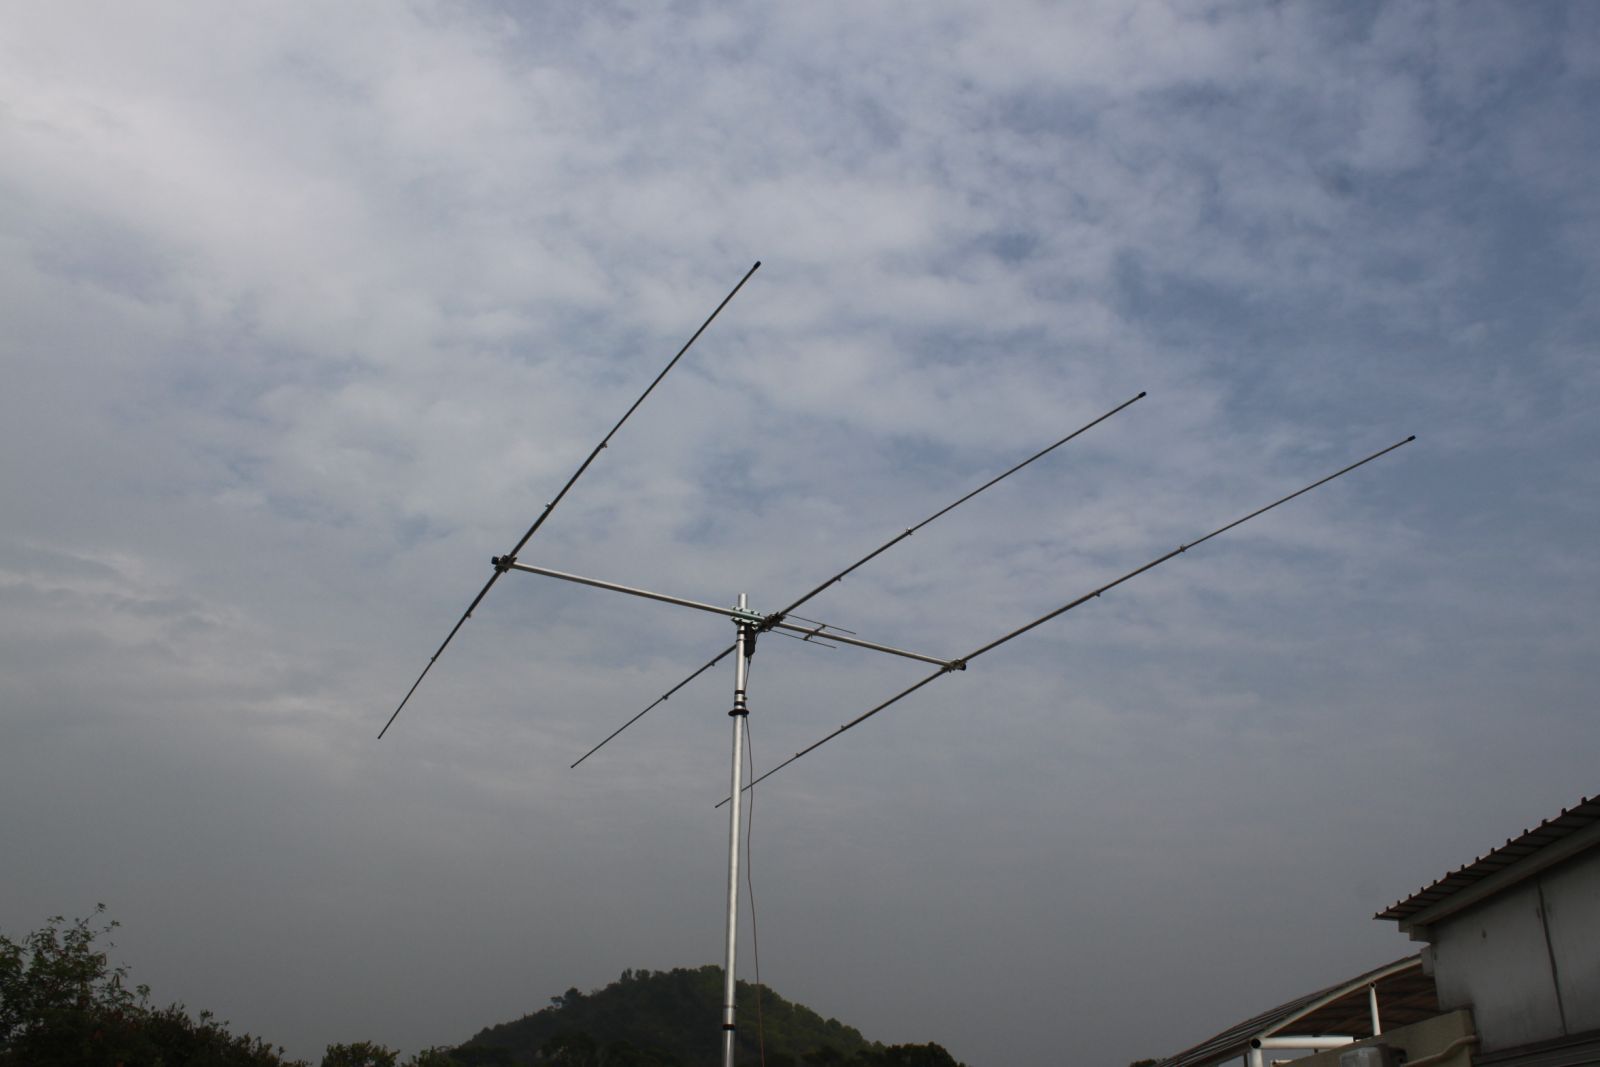 Peng Chau Island VR2/IV3TAN Antenna